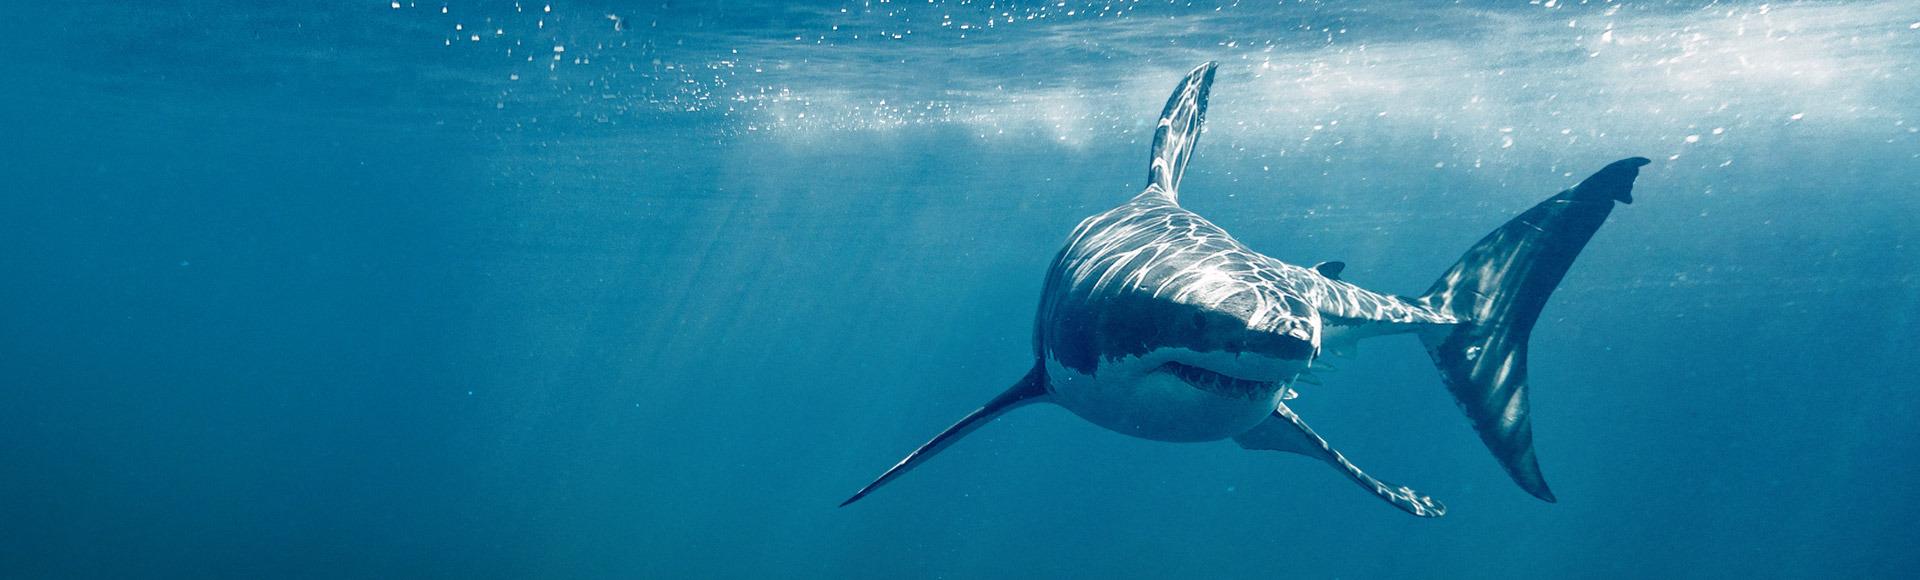 Köpekbalığı Ayı